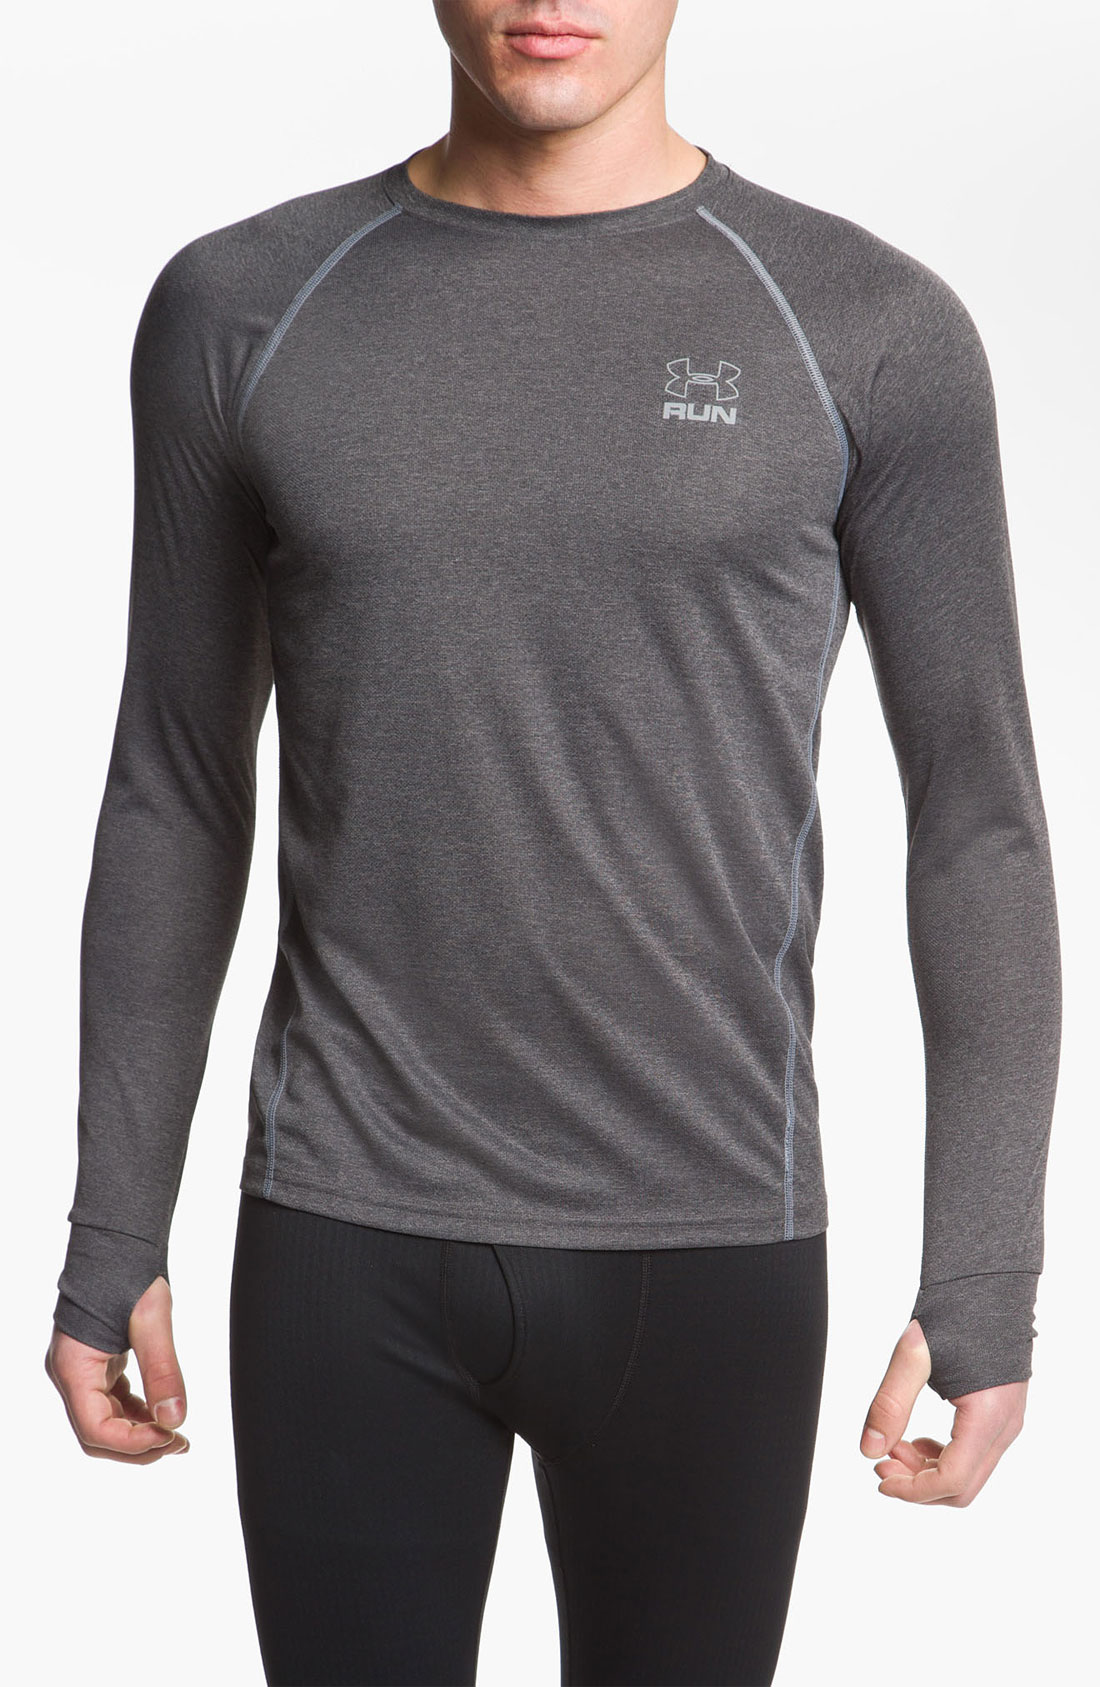 Under armour run regular fit heatgear tshirt in gray for for Gray under armour shirt